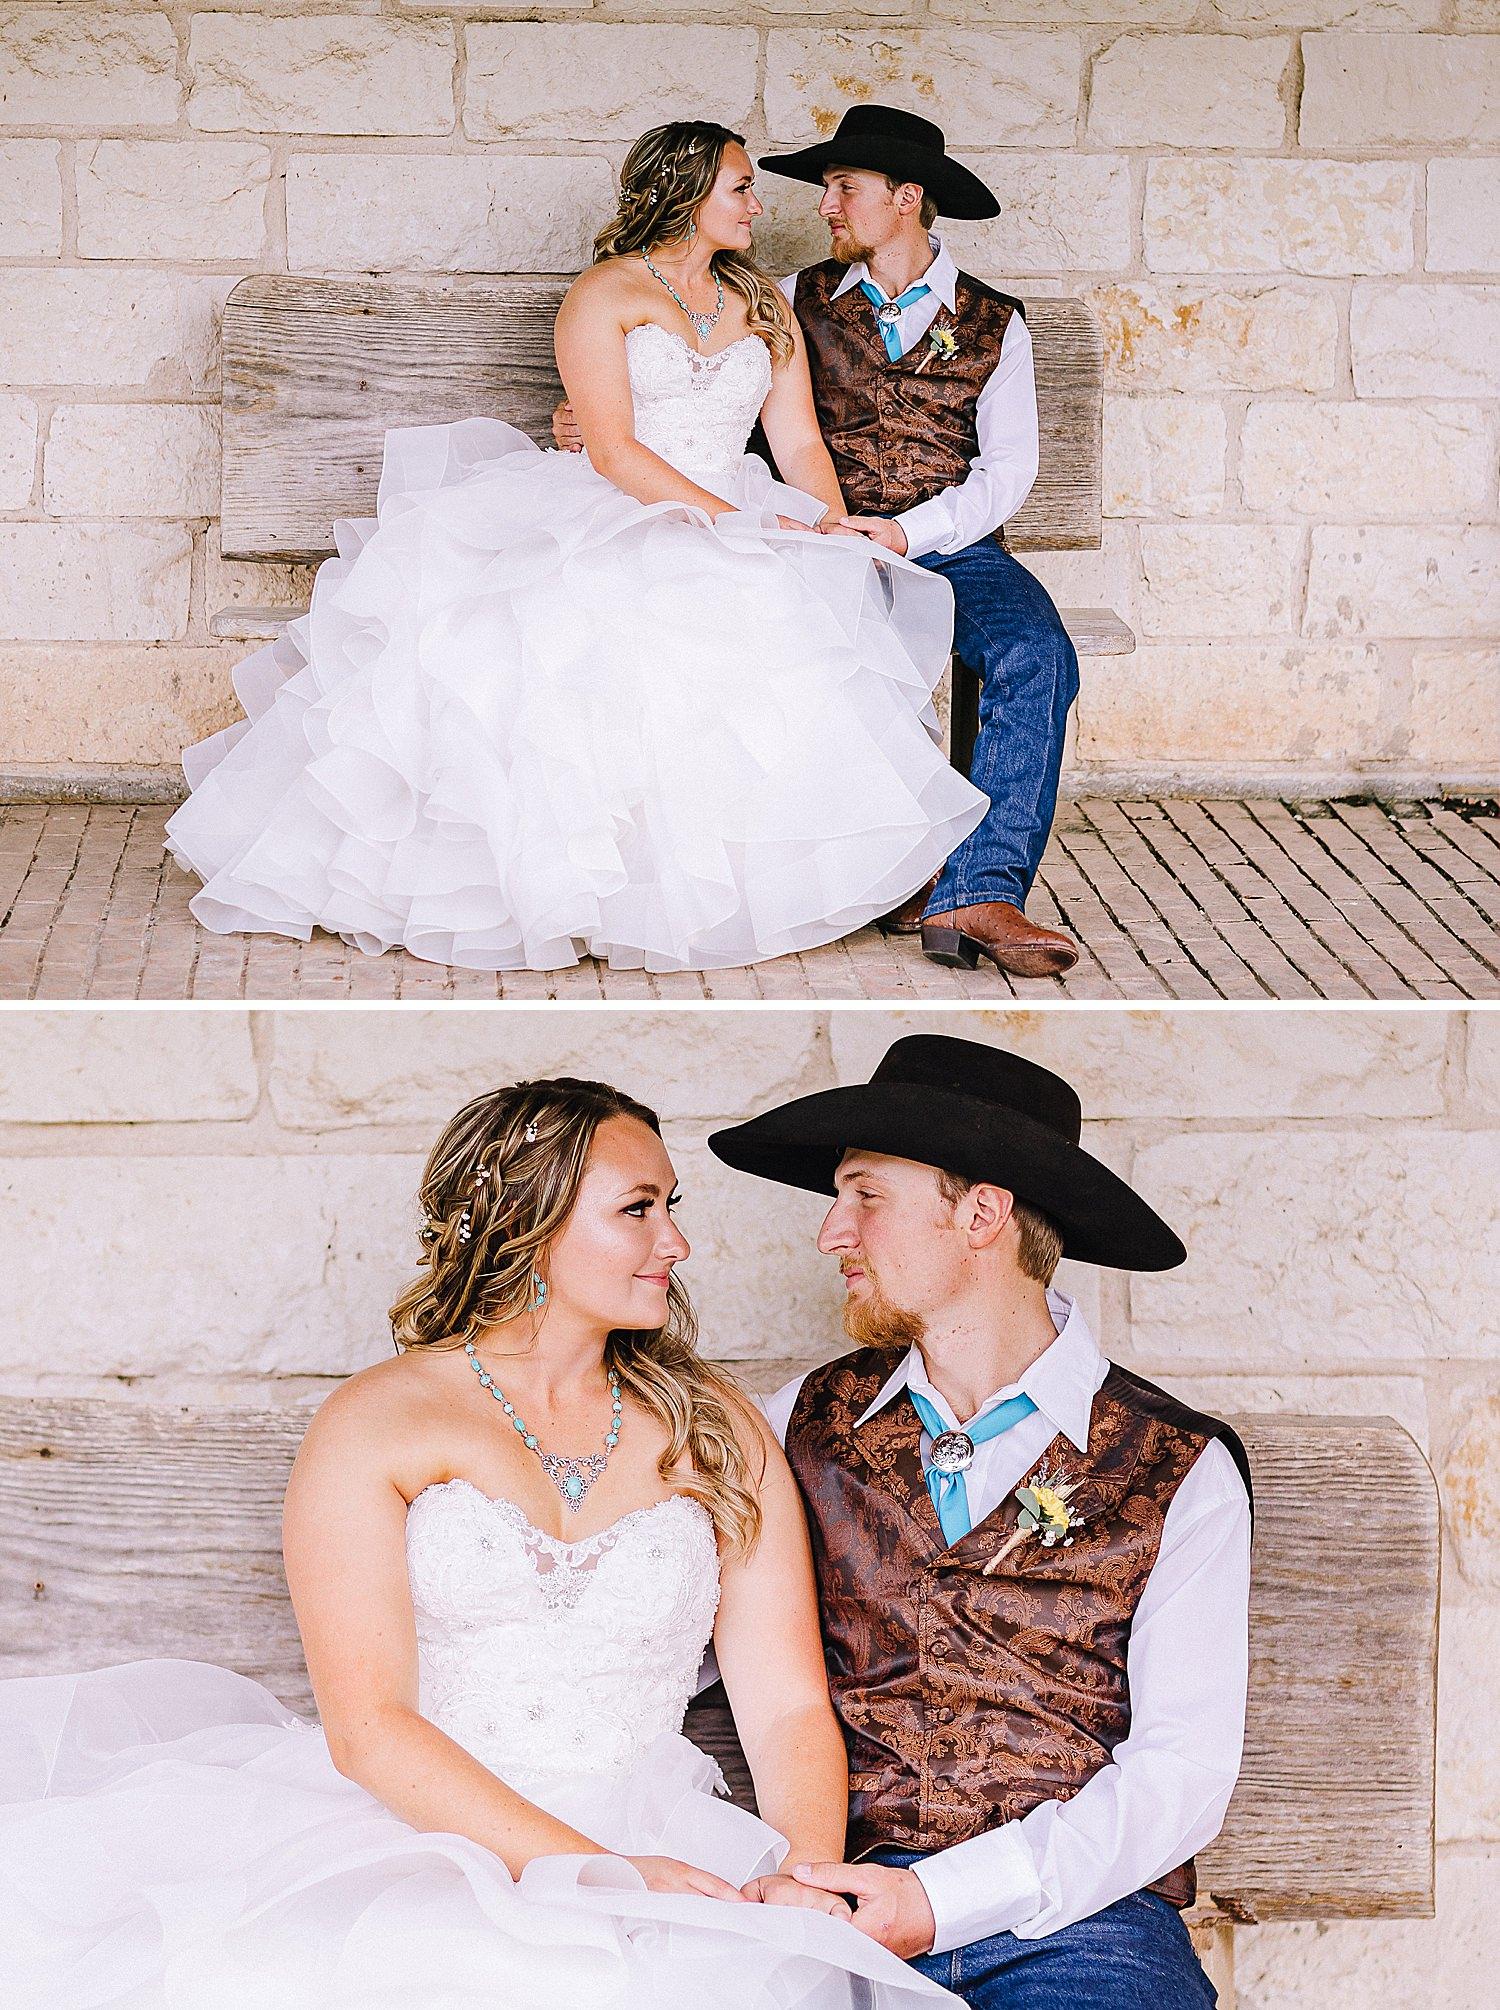 Carly-Barton-Photography-Old-Town-Texas-Rustic-Wedding-Photos-Sunflowers-Boots-Kyle-Texas_0059.jpg